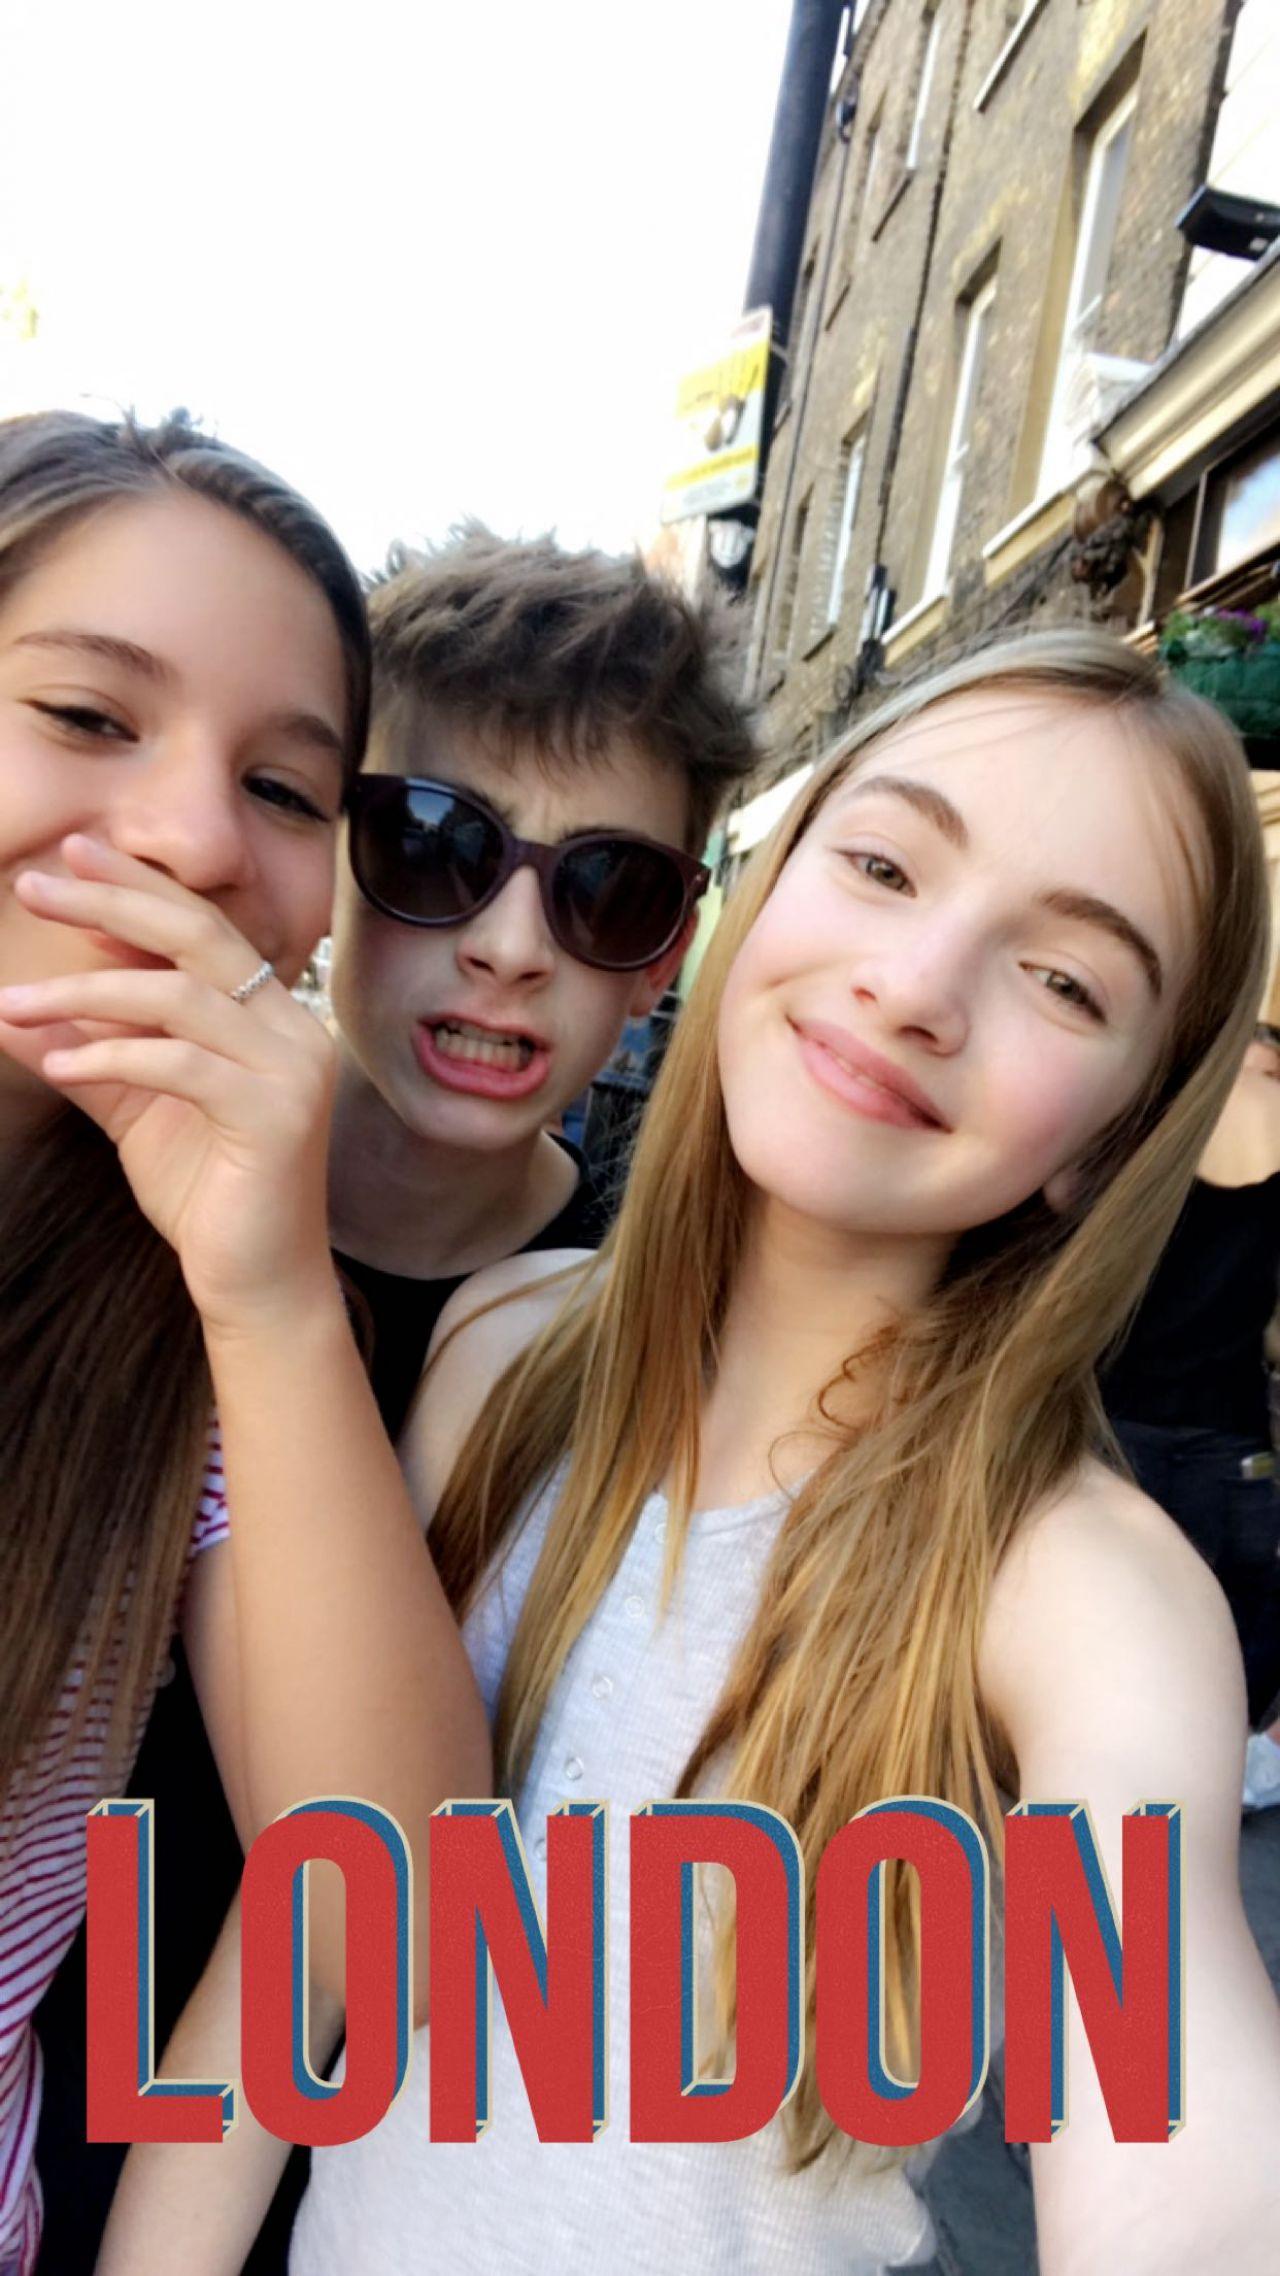 Lauren Orlando Social Media Pics 06 13 2017